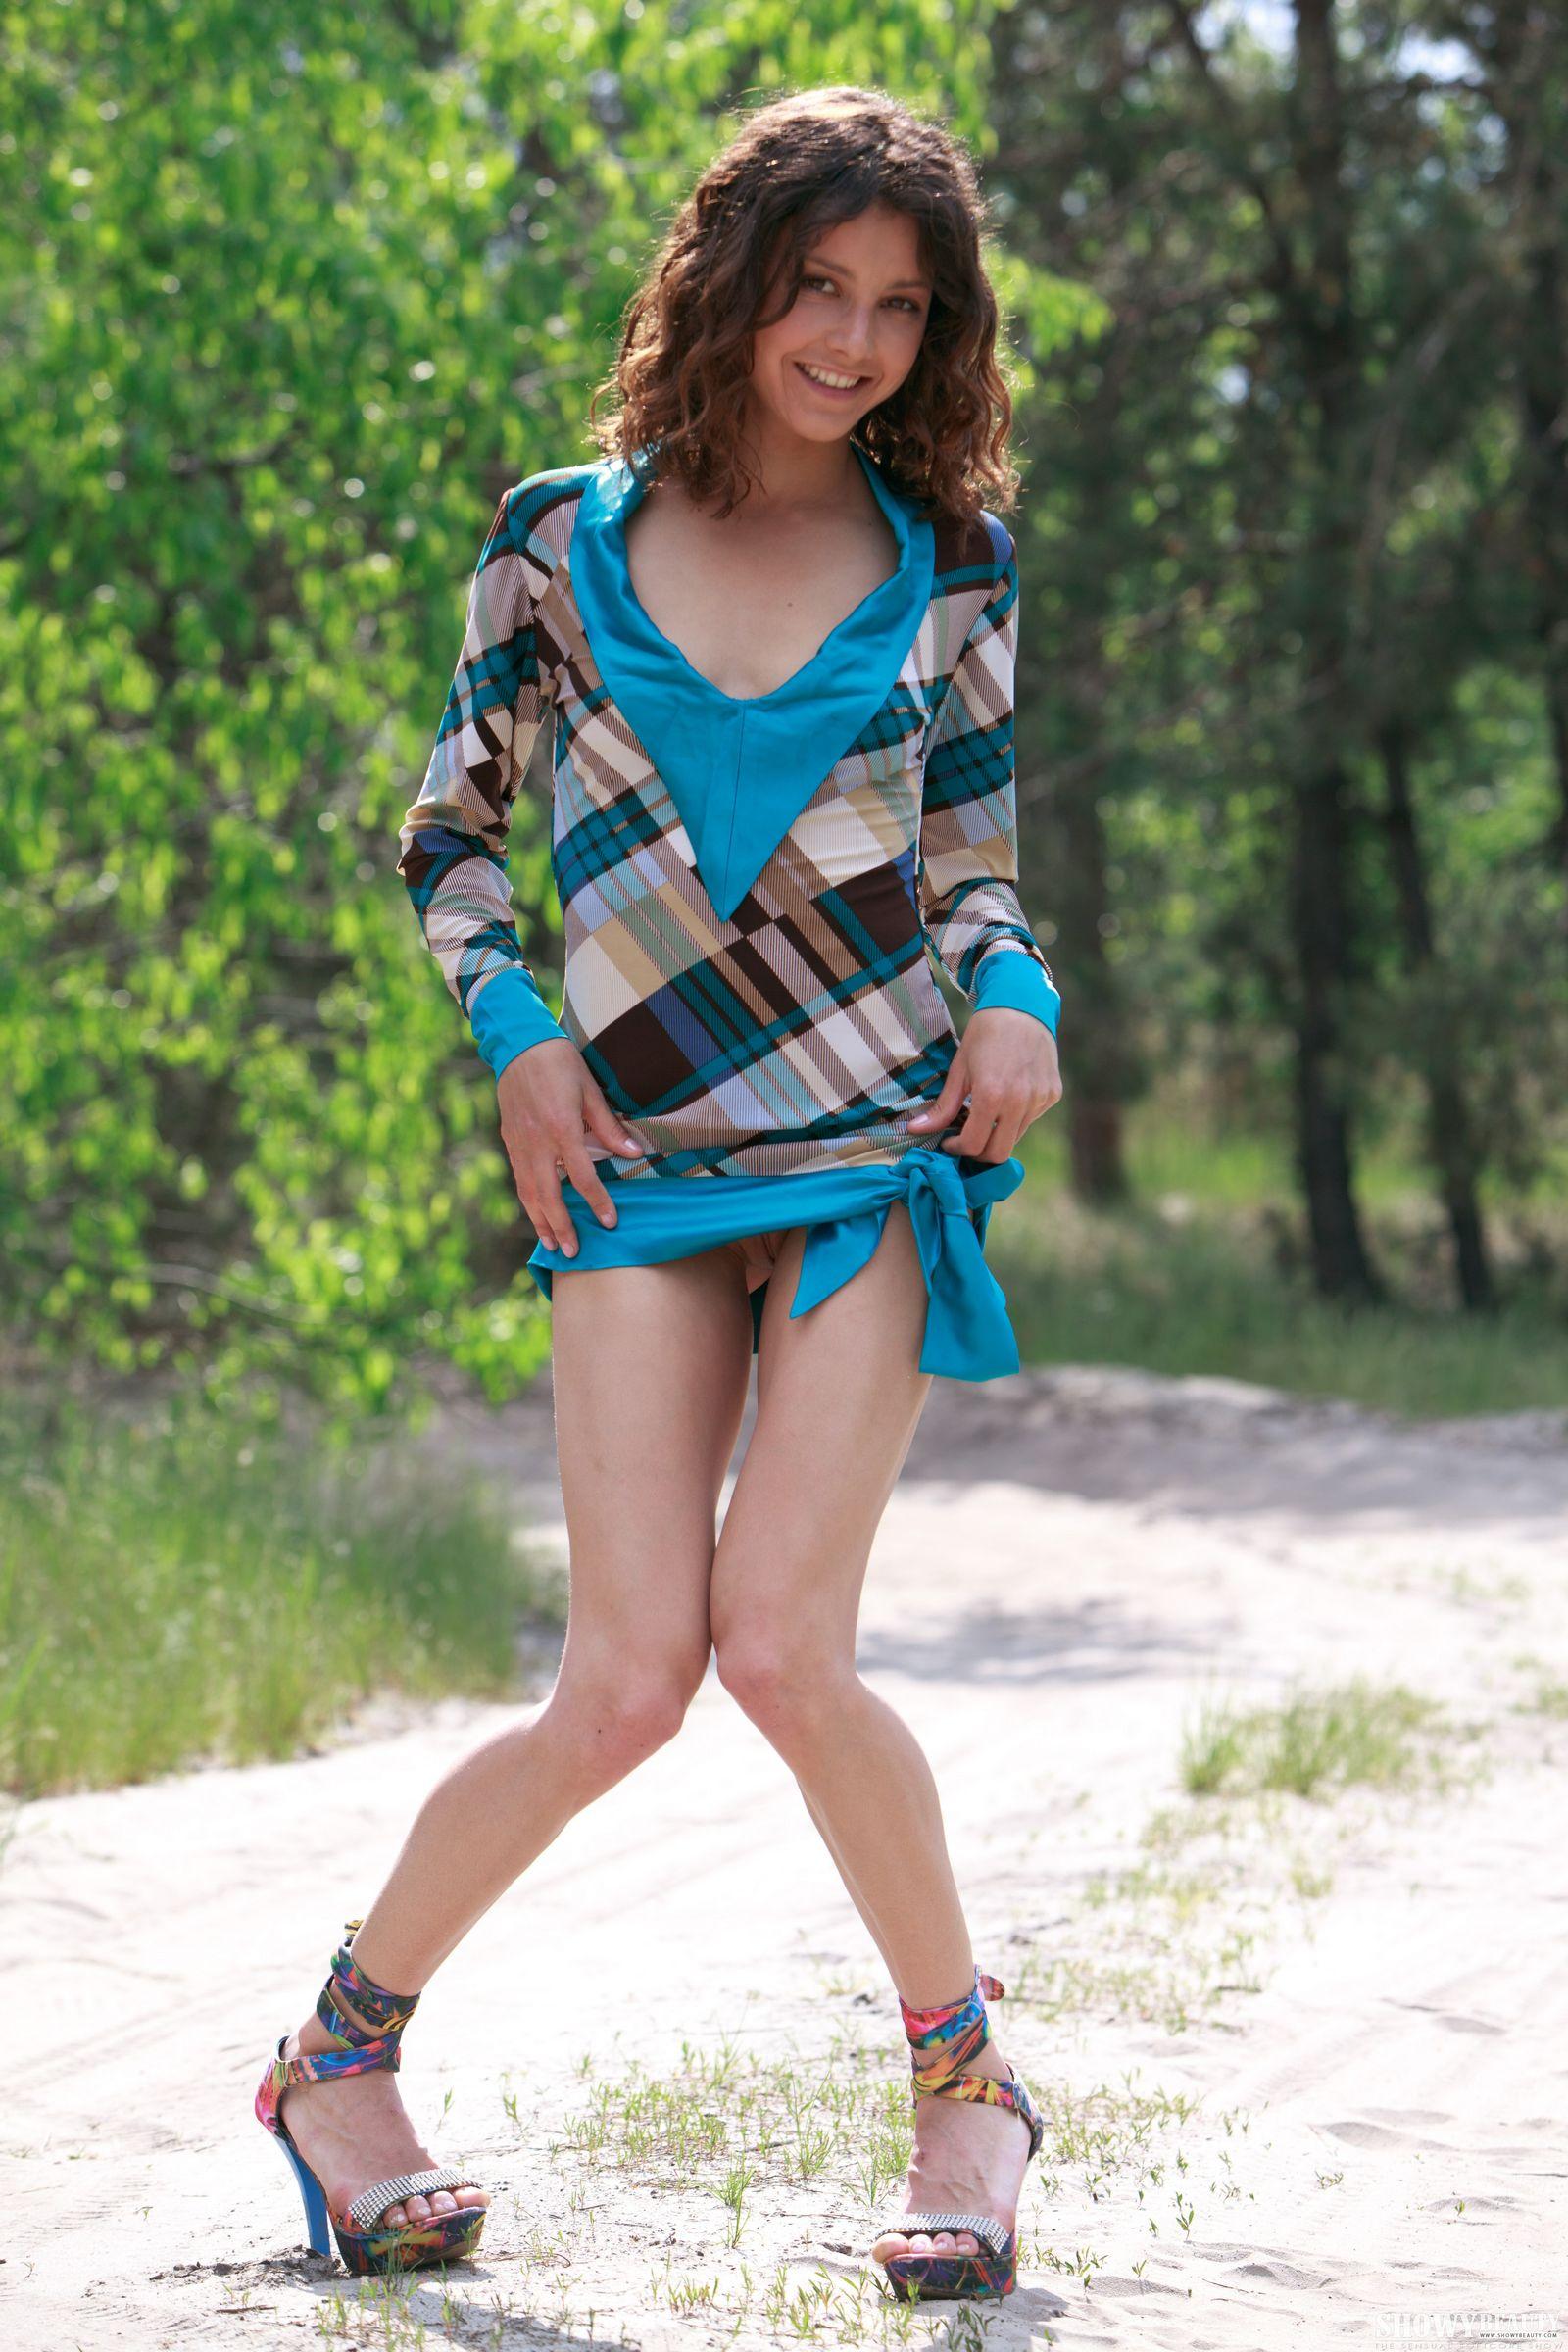 Молодая красавица без трусов в короткой юбке